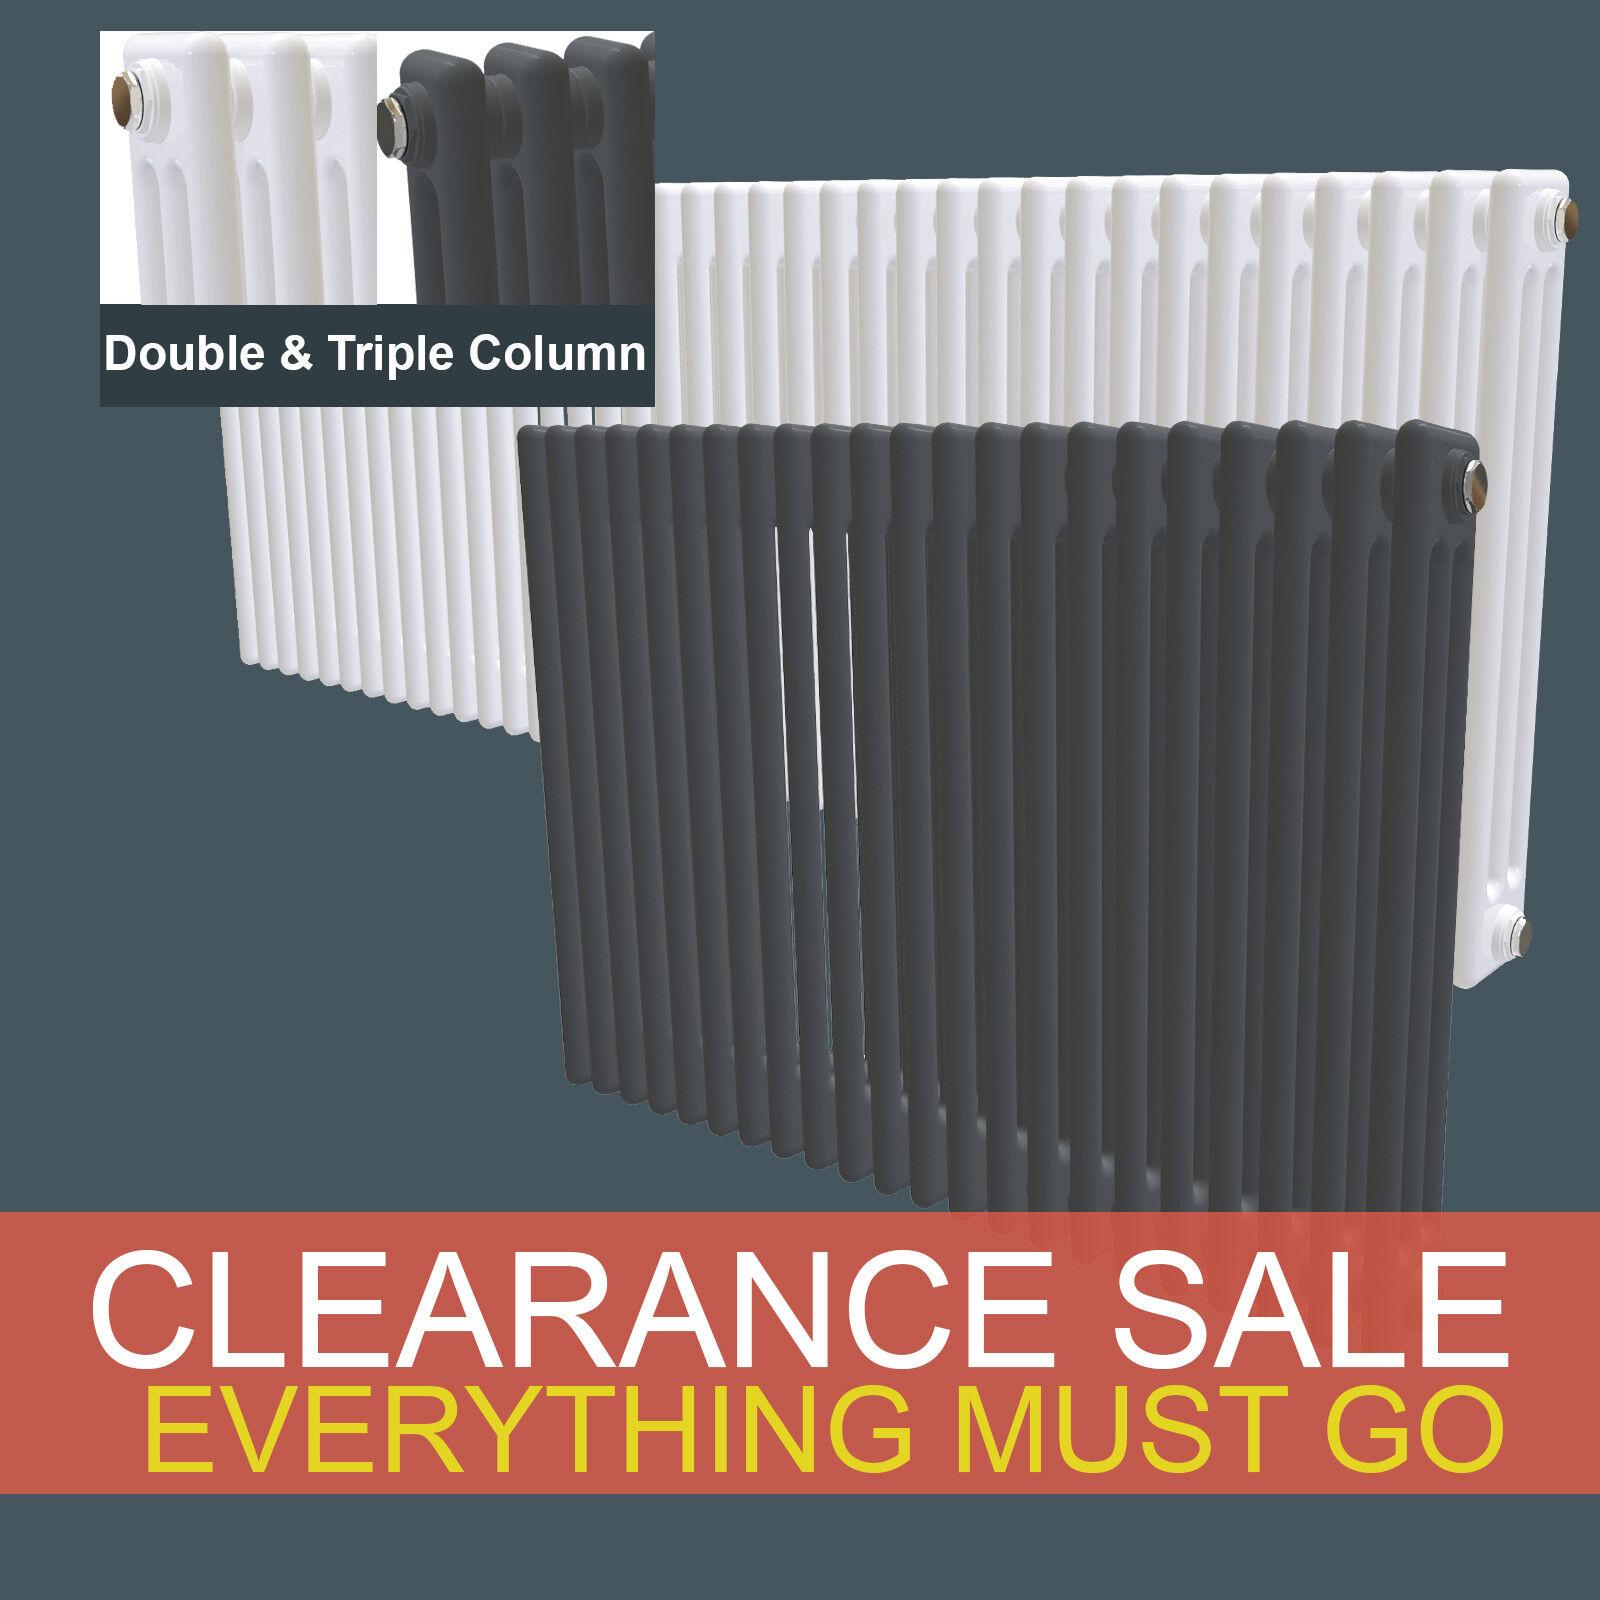 Clearance Sale - Horizontal & Grünical Victorian Style Columns Radiator